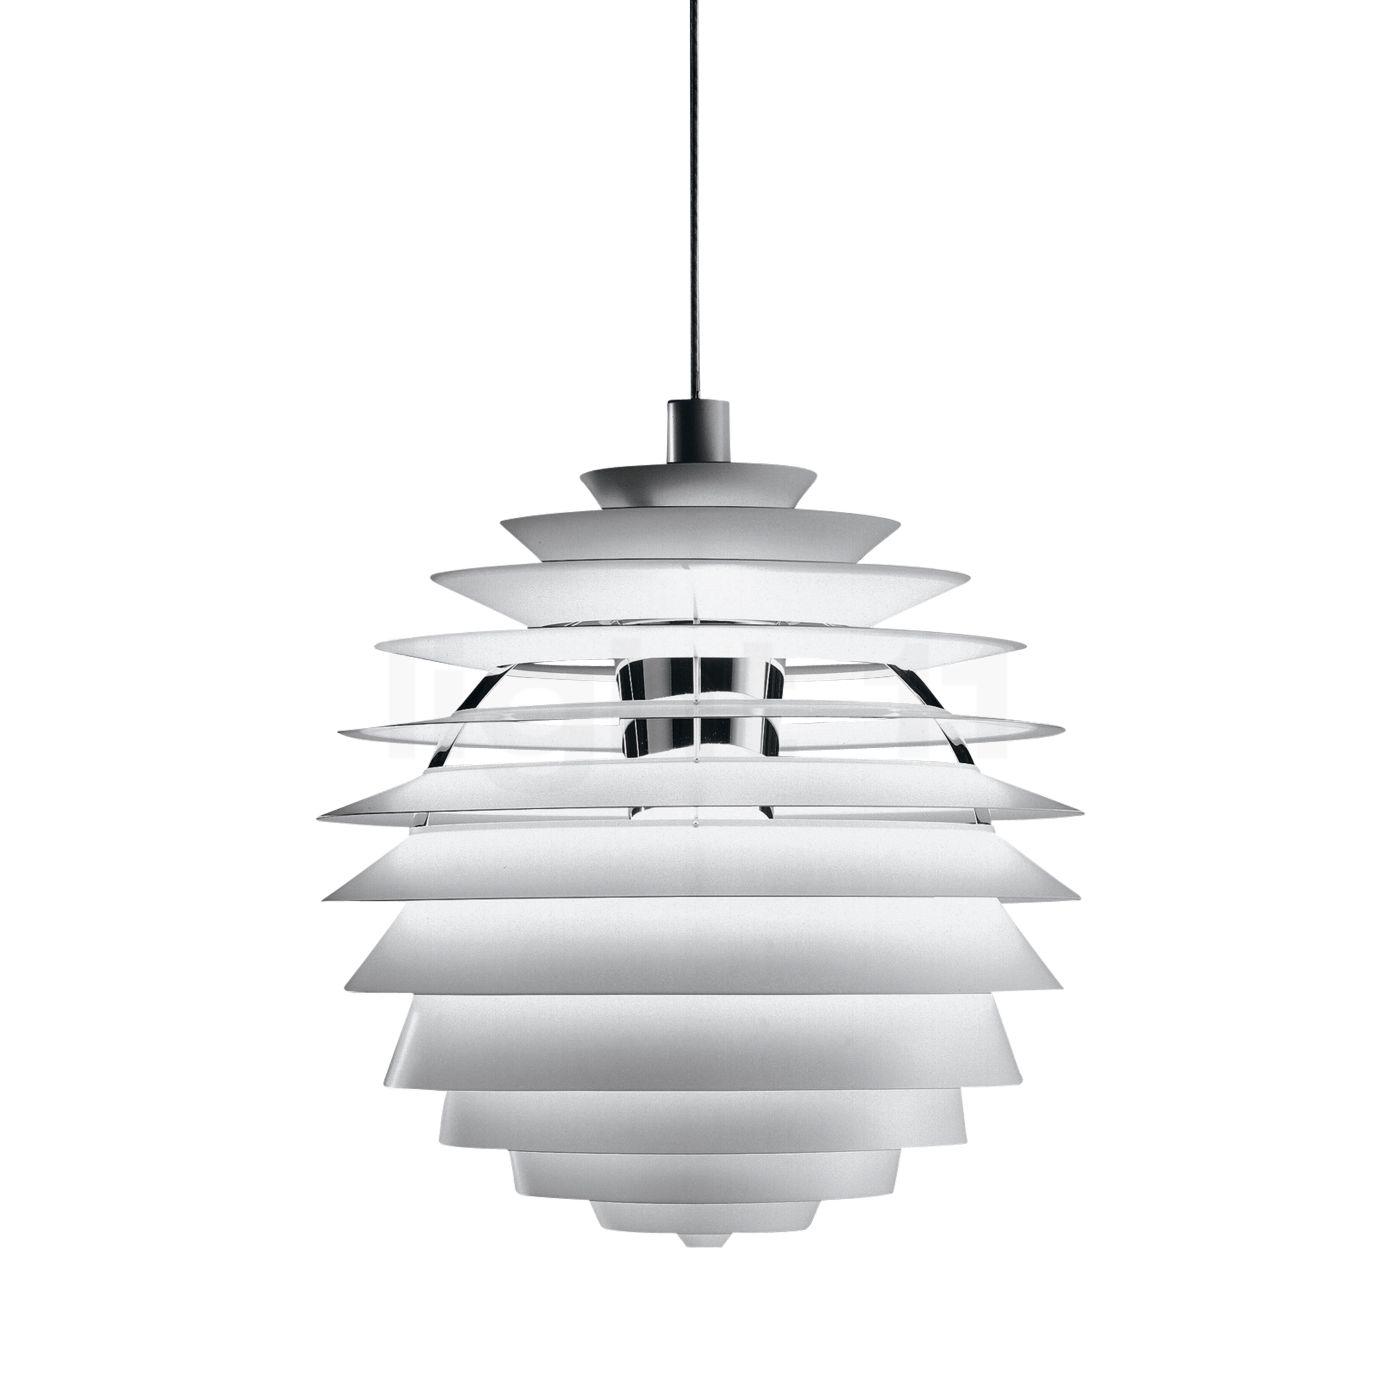 sc 1 st  Design lights u0026 designer l&s light11.eu & Buy Louis Poulsen PH Louvre Pendant light LED at light11.eu